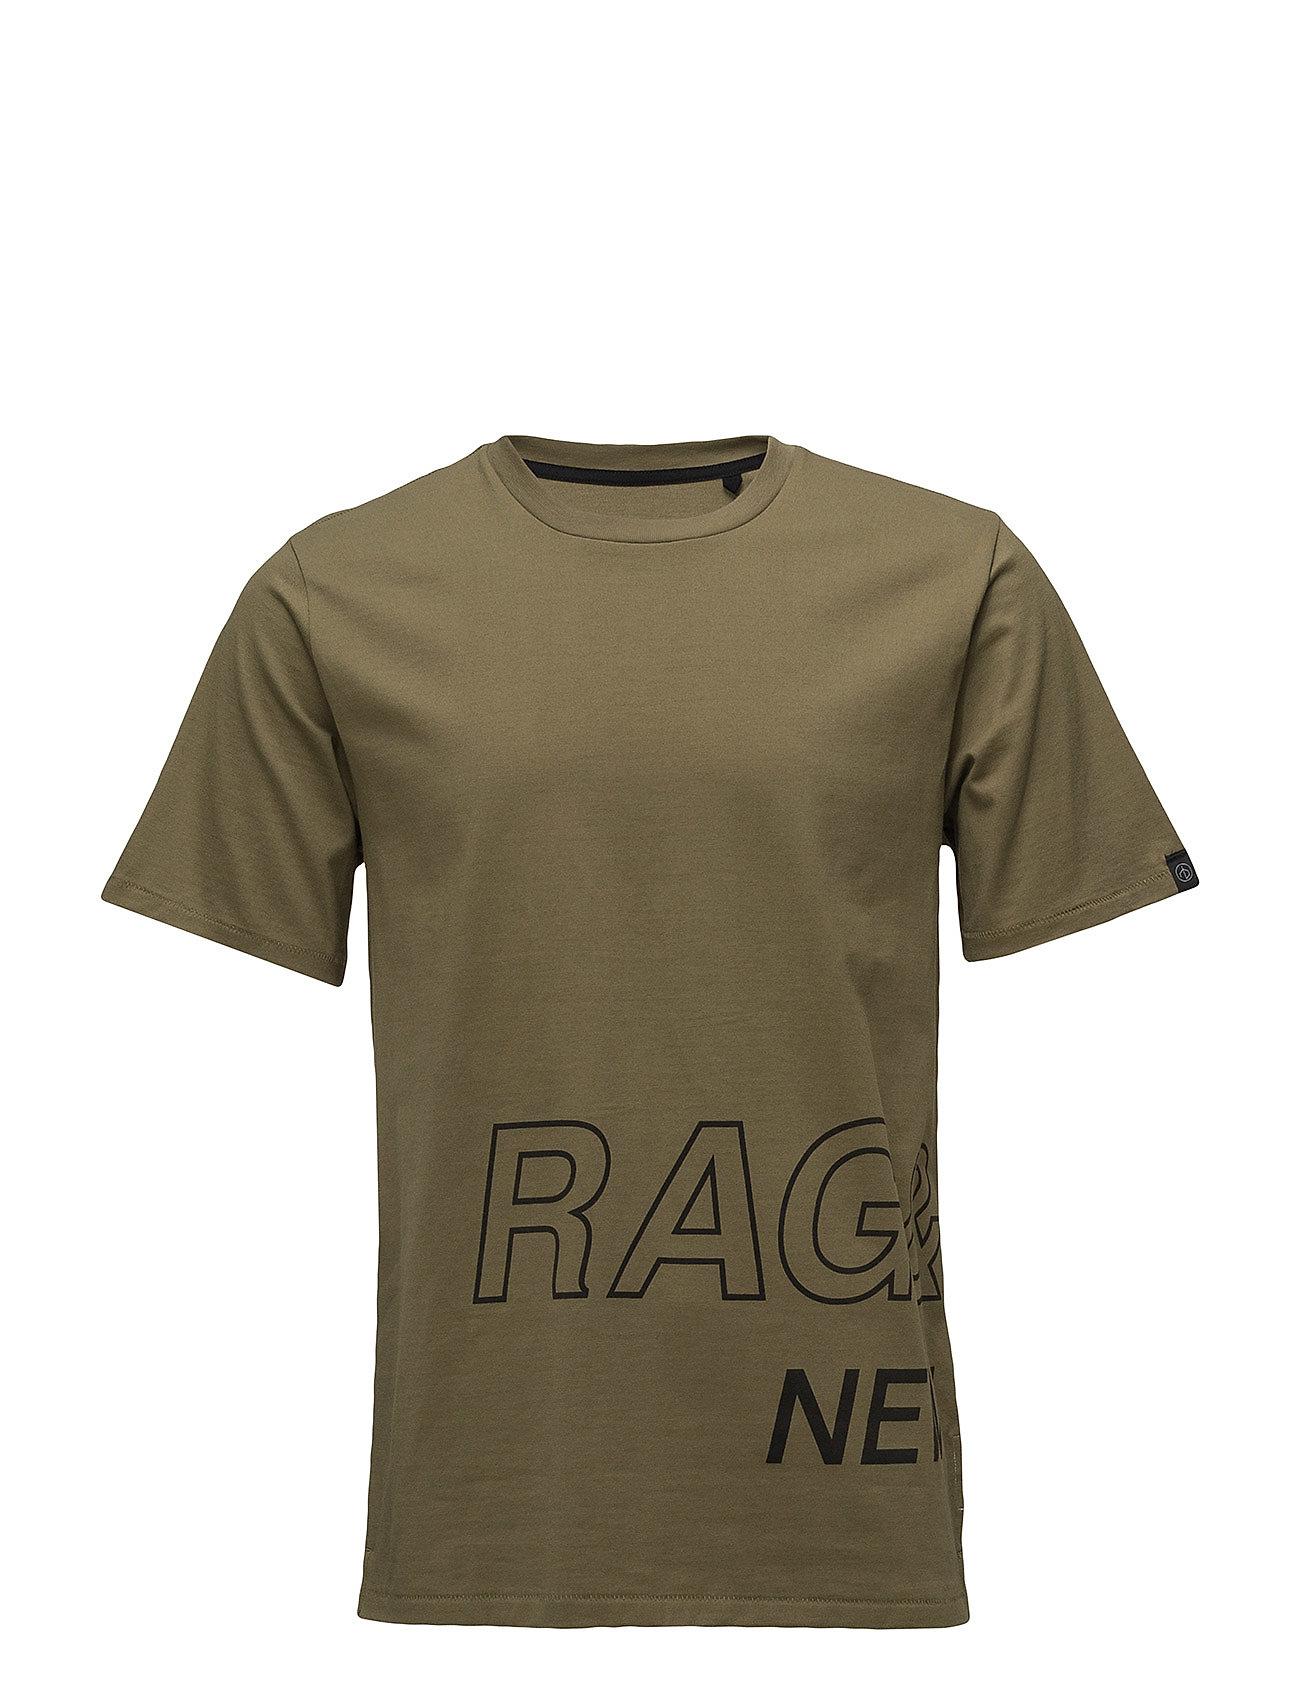 Image of Rb Wrap Around Tee (2972371221)